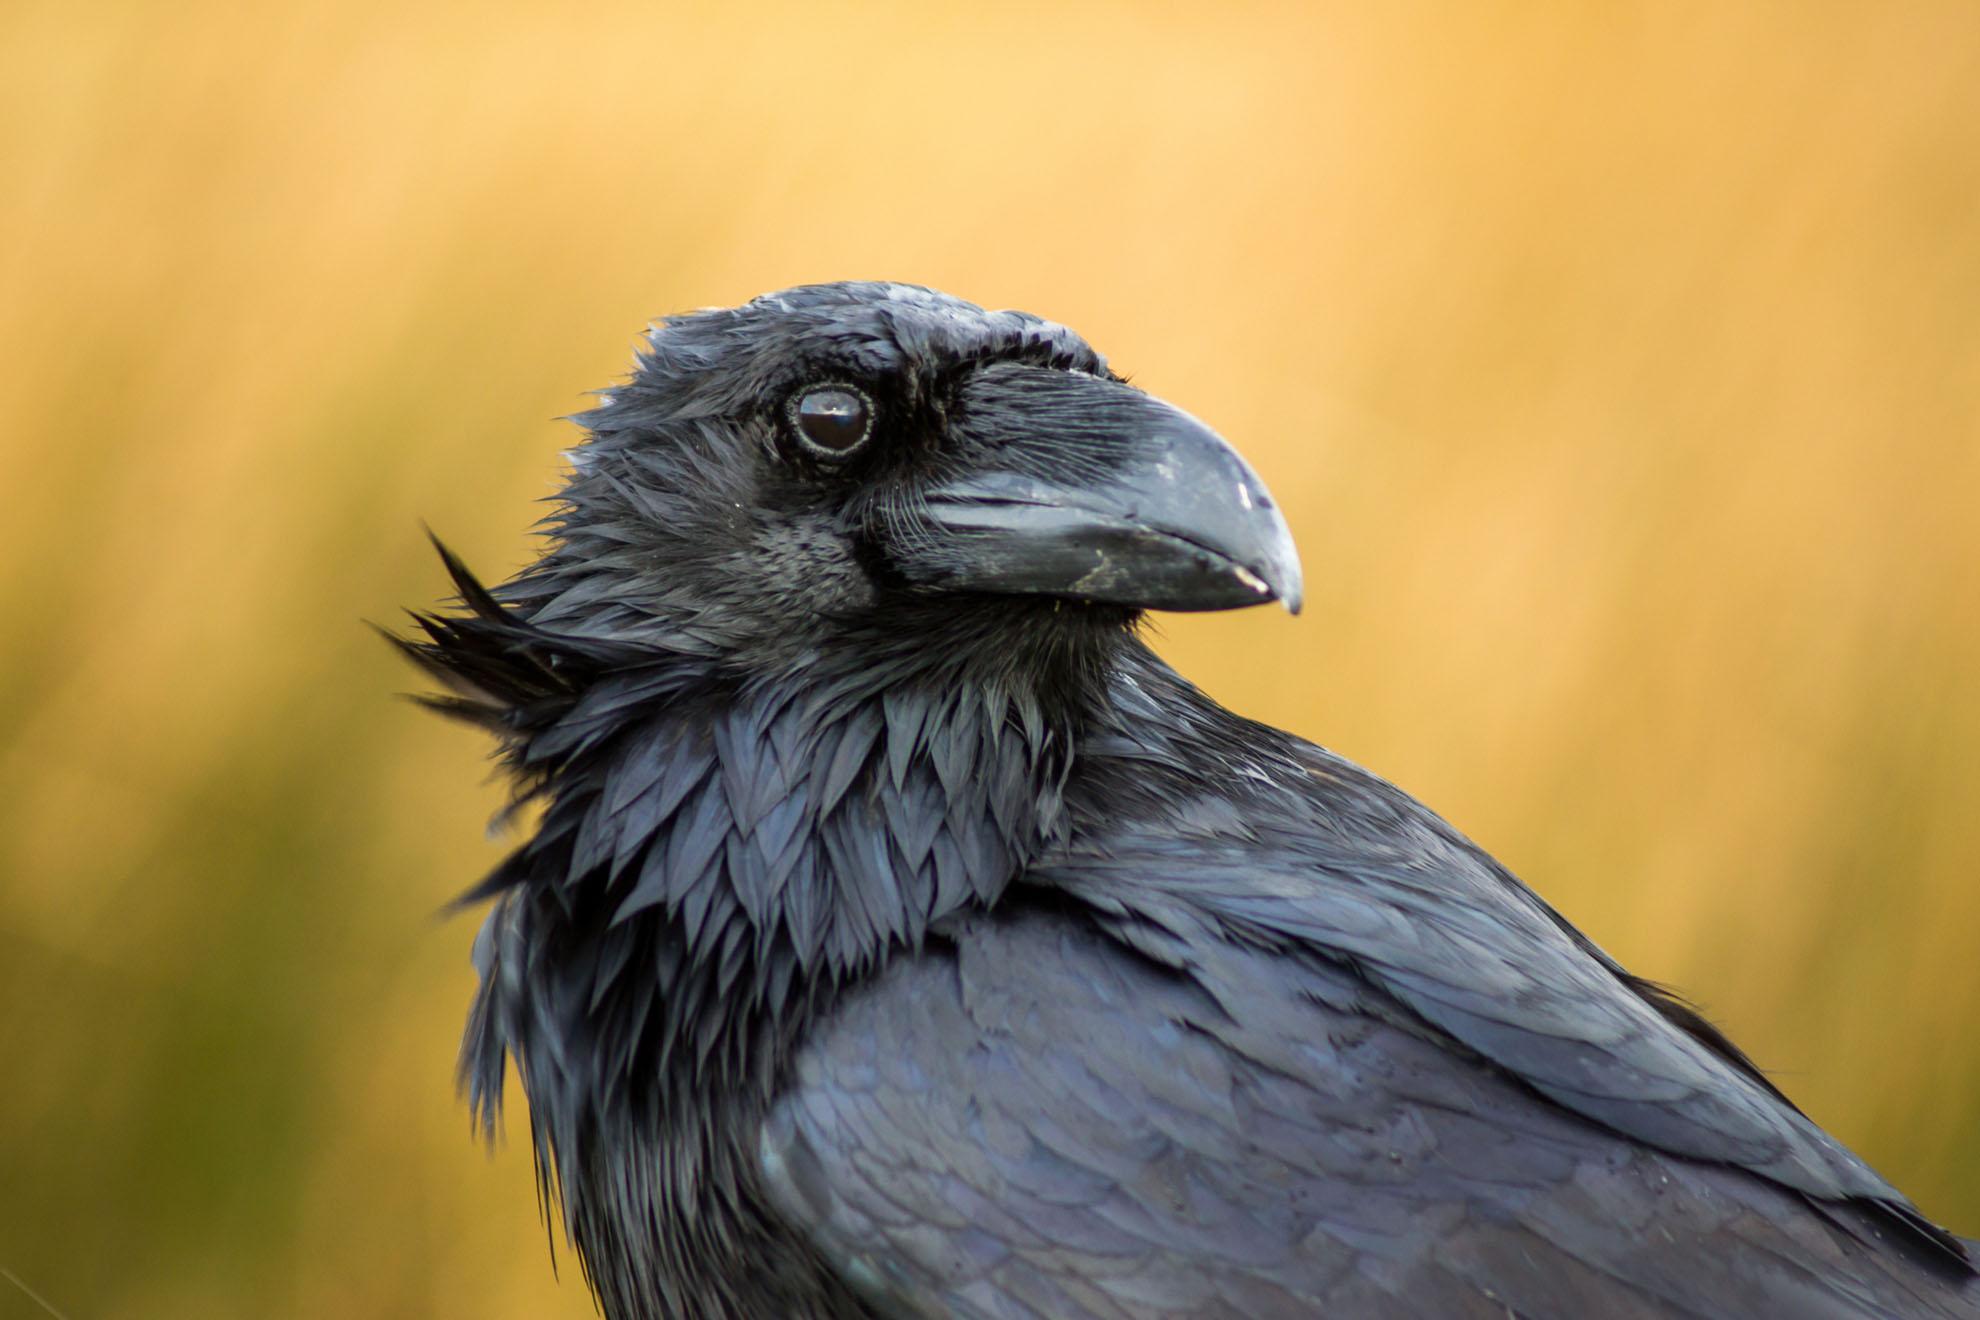 Orange Raven - SEO Agentur